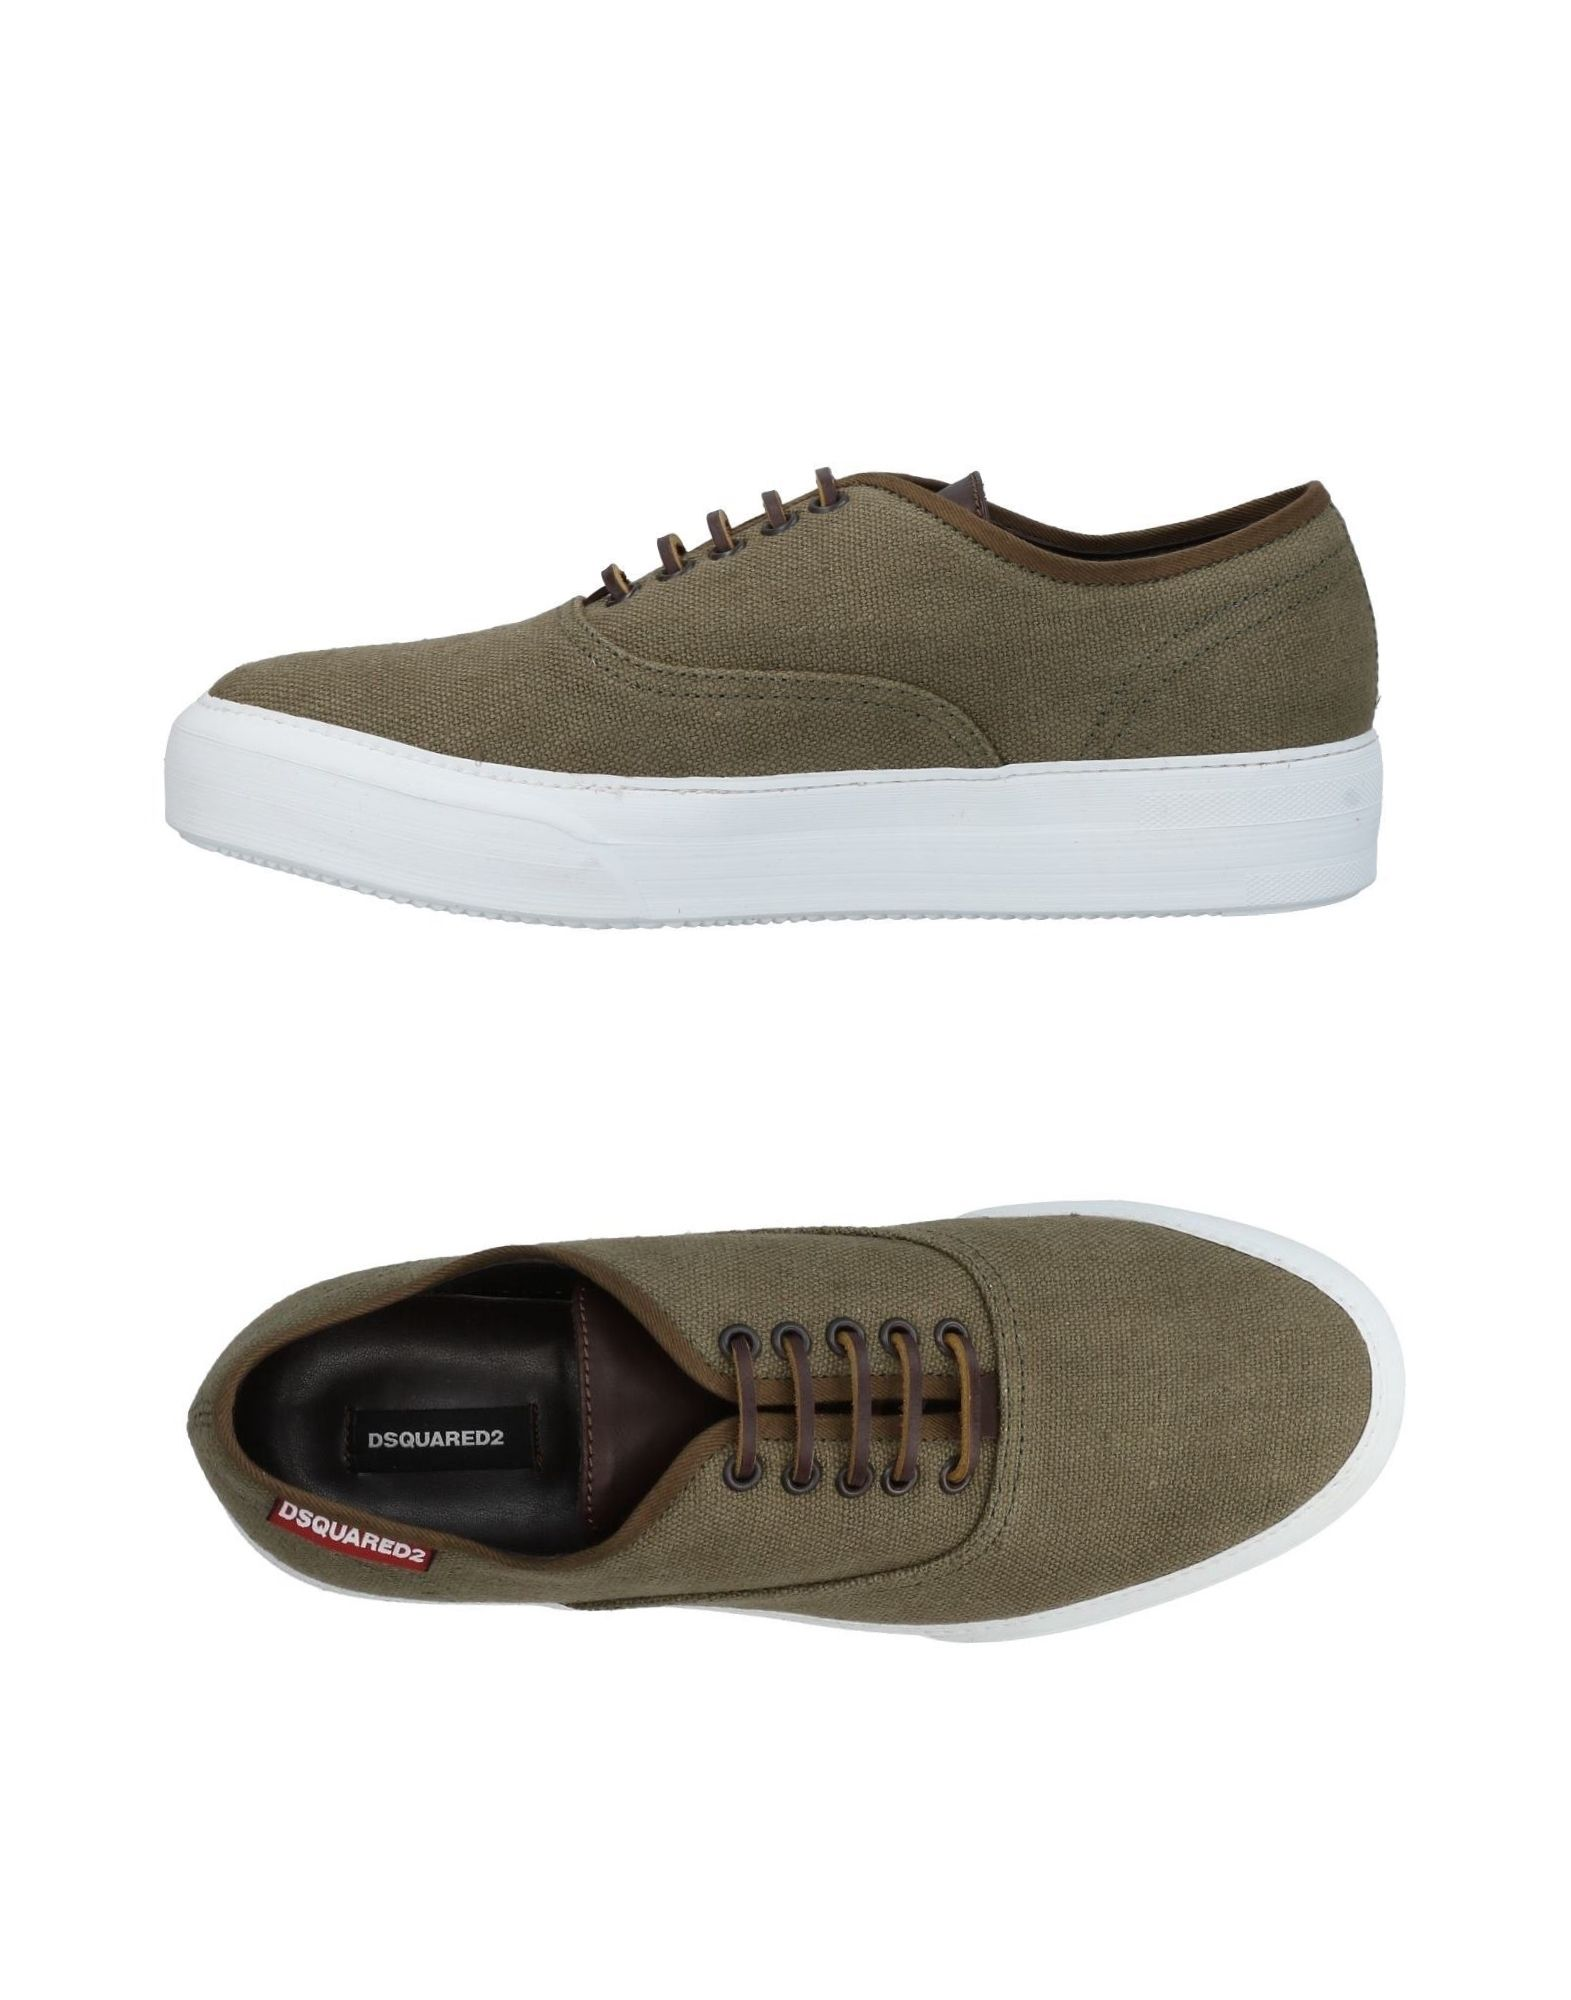 Dsquared2 Sneakers - Men Dsquared2 Dsquared2 Dsquared2 Sneakers online on  Australia - 11441421OW 211f86